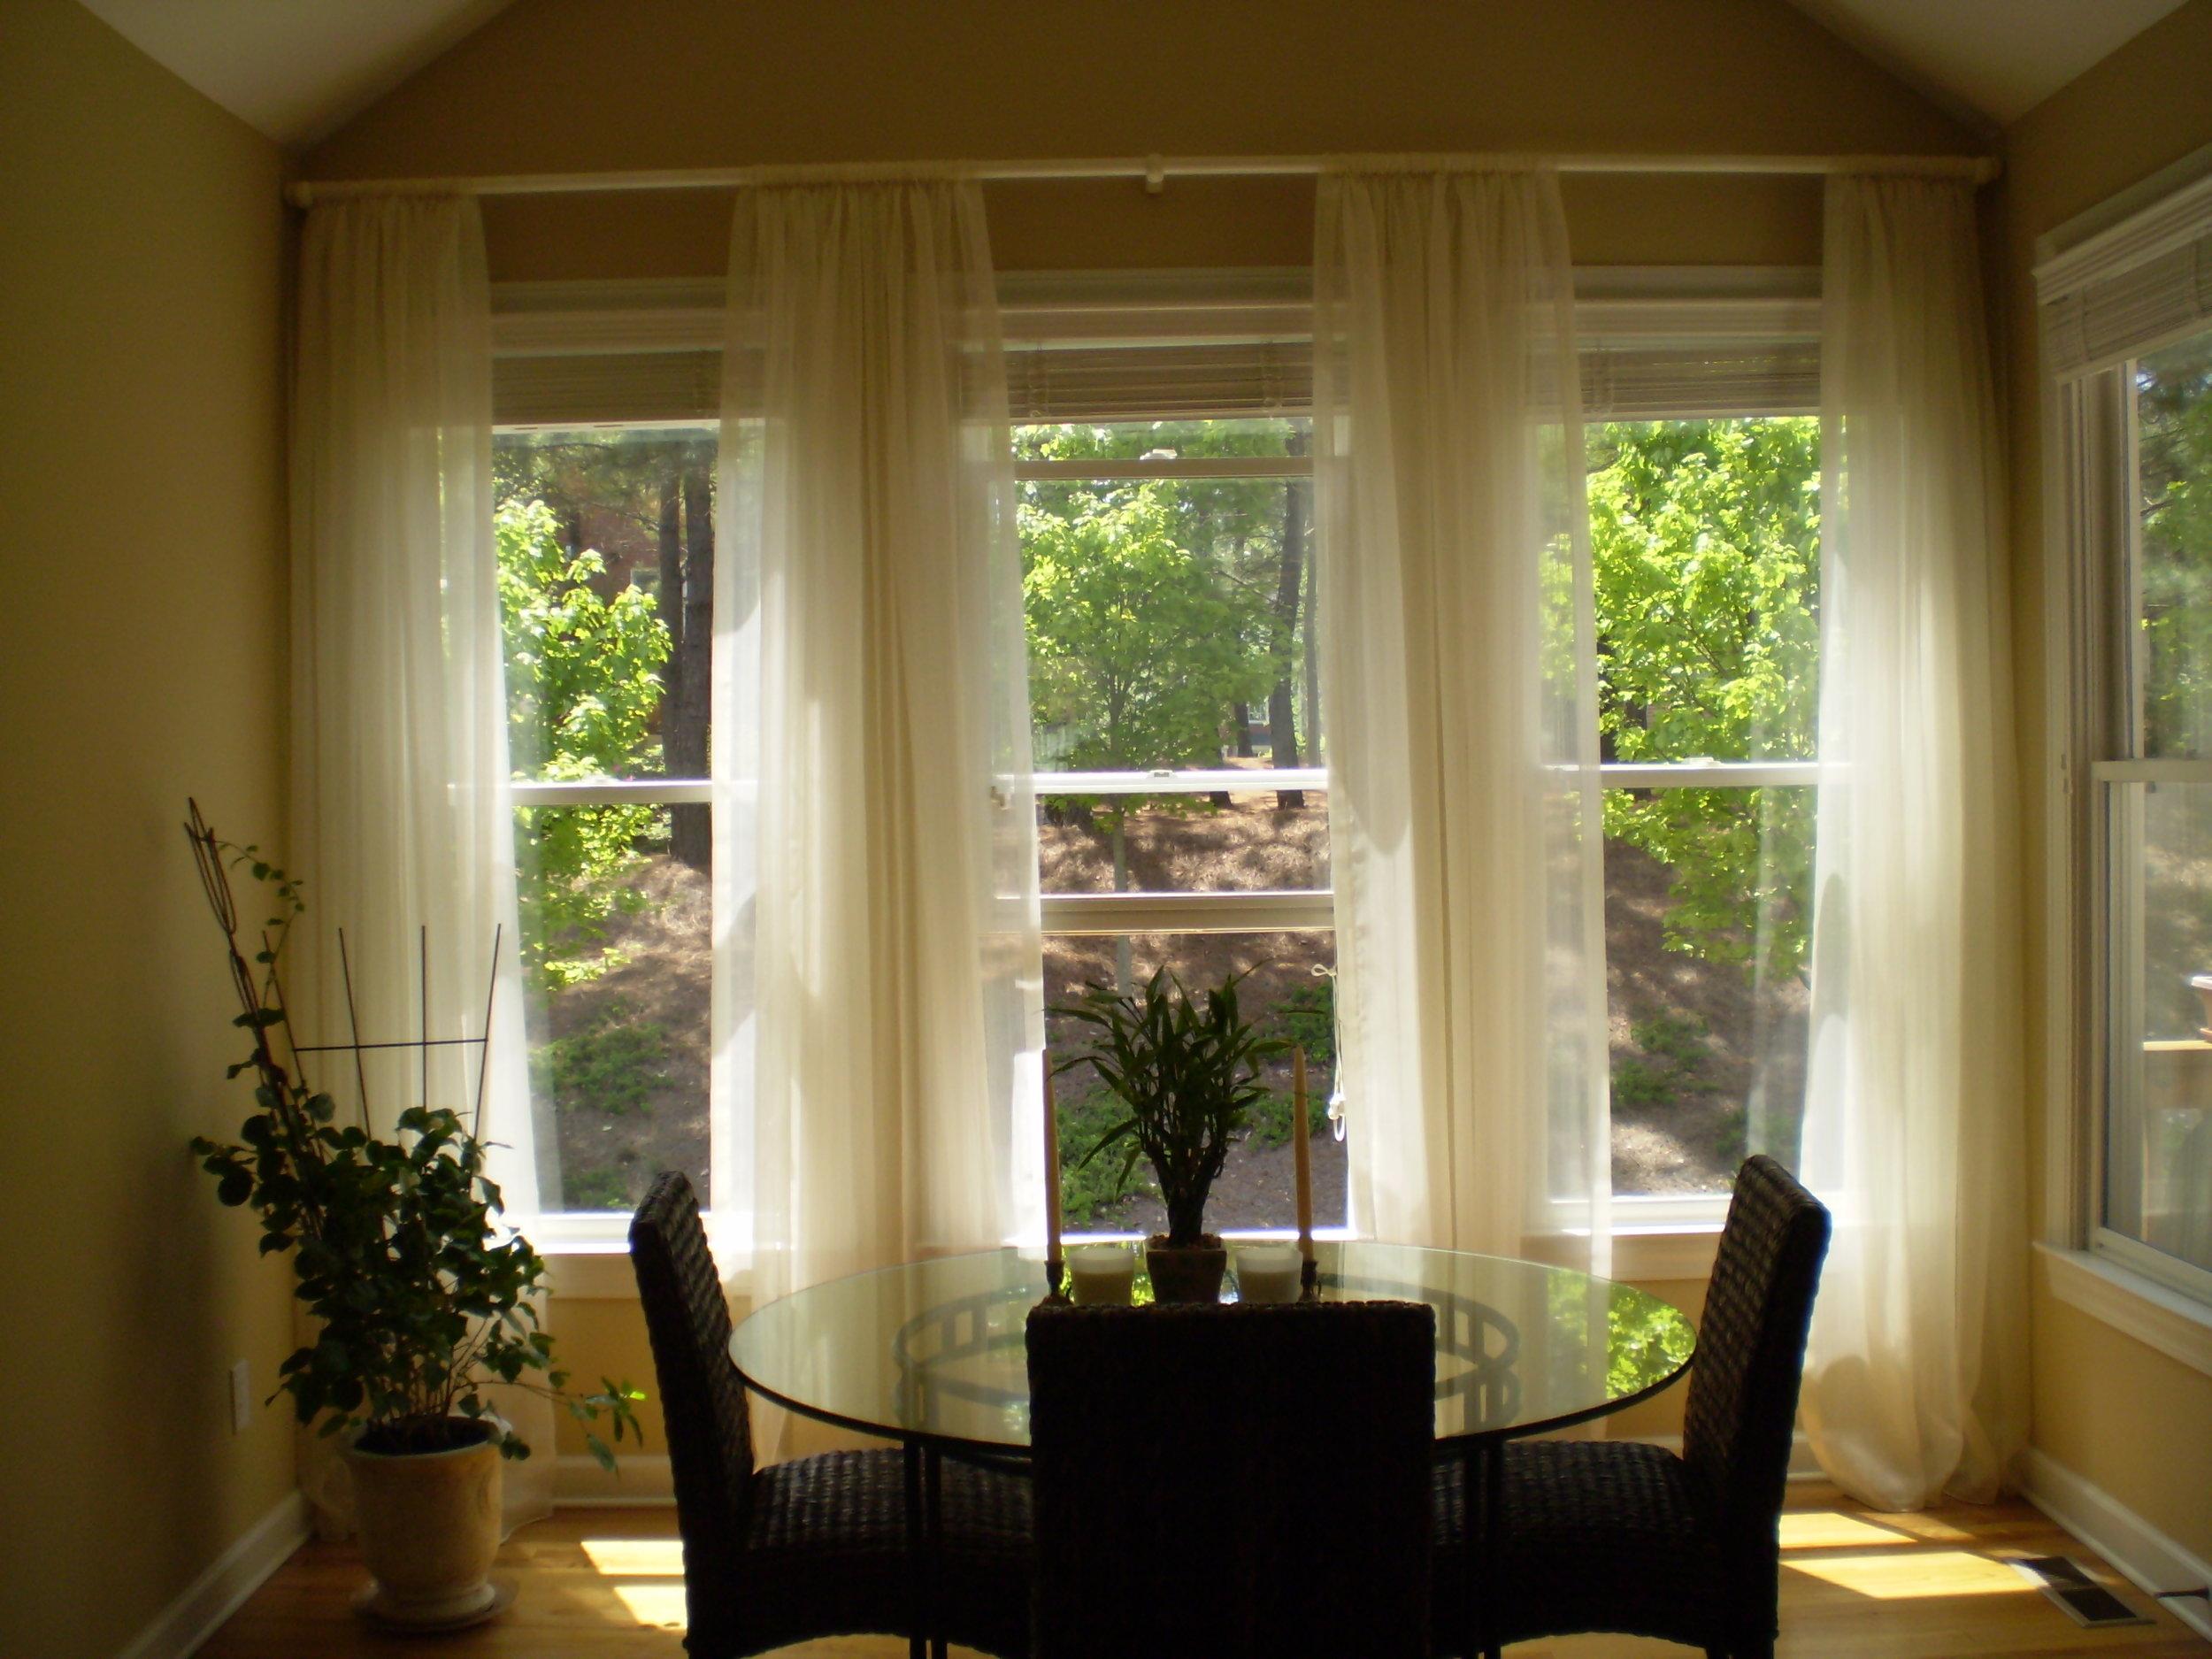 custom-blinds-drapery-shades-interior-design-atlanta-georgia-19.JPG